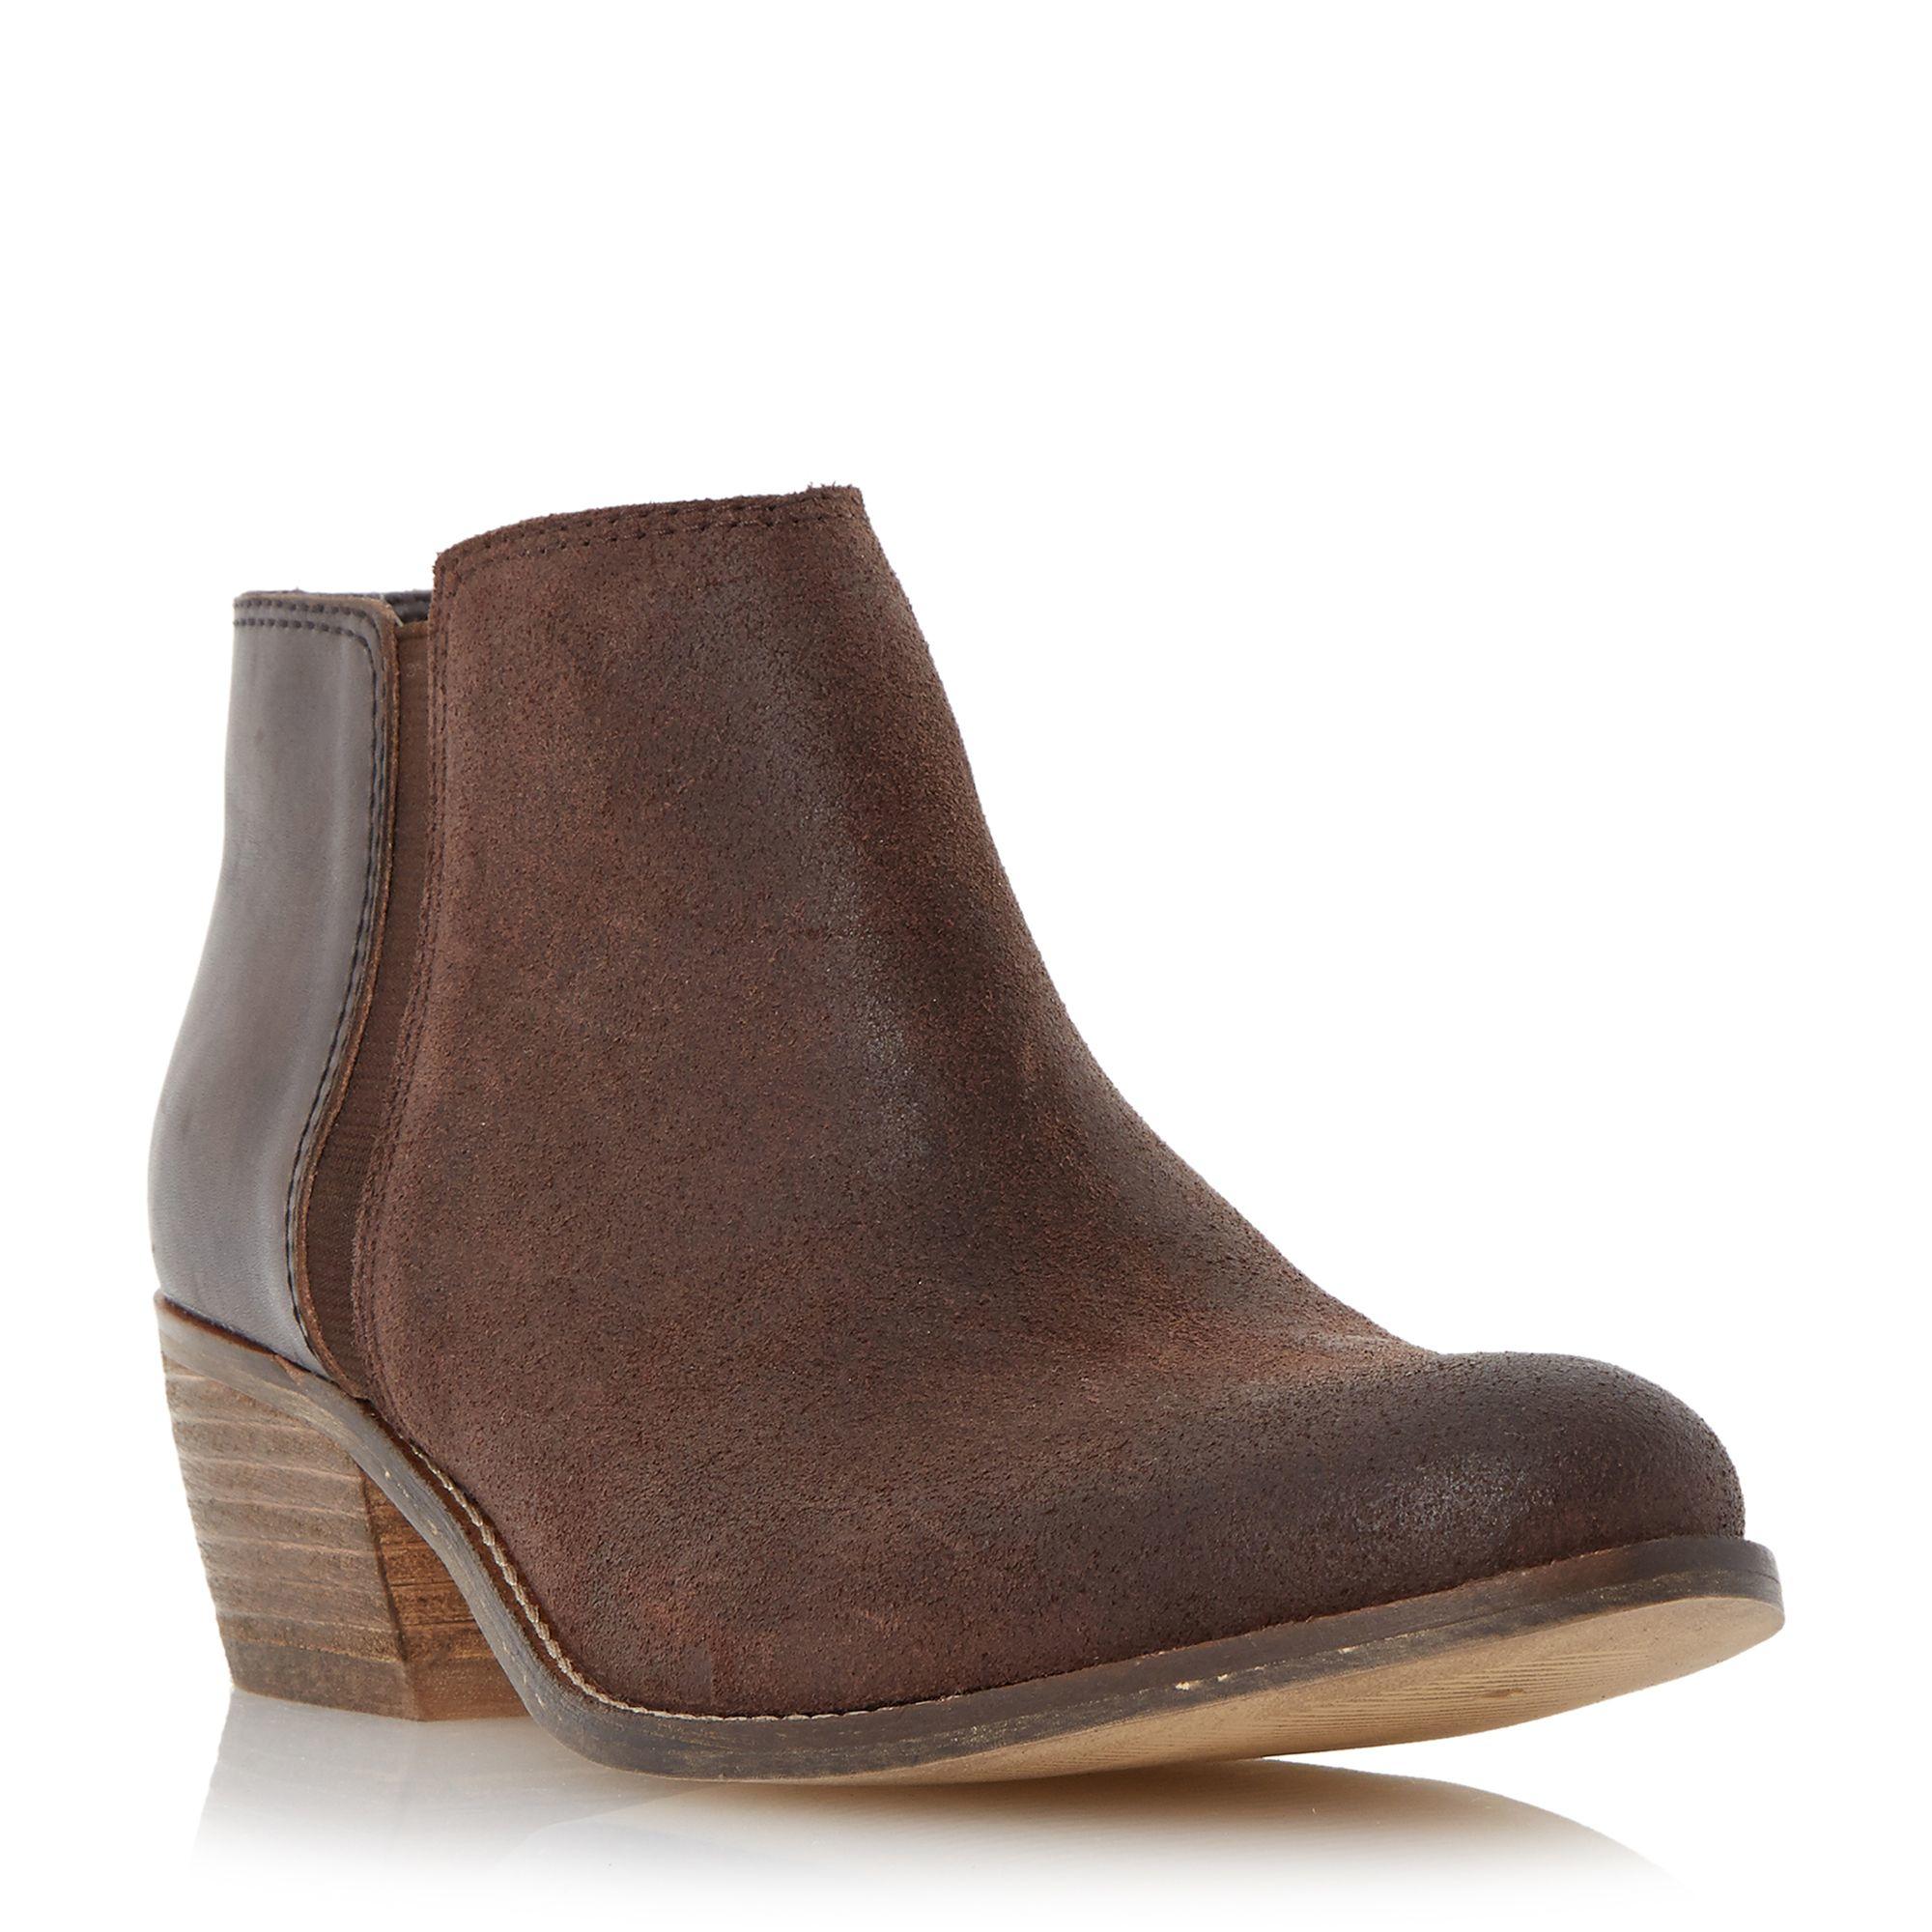 Dune Penelope Low Heel Ankle Boots in Brown | Lyst